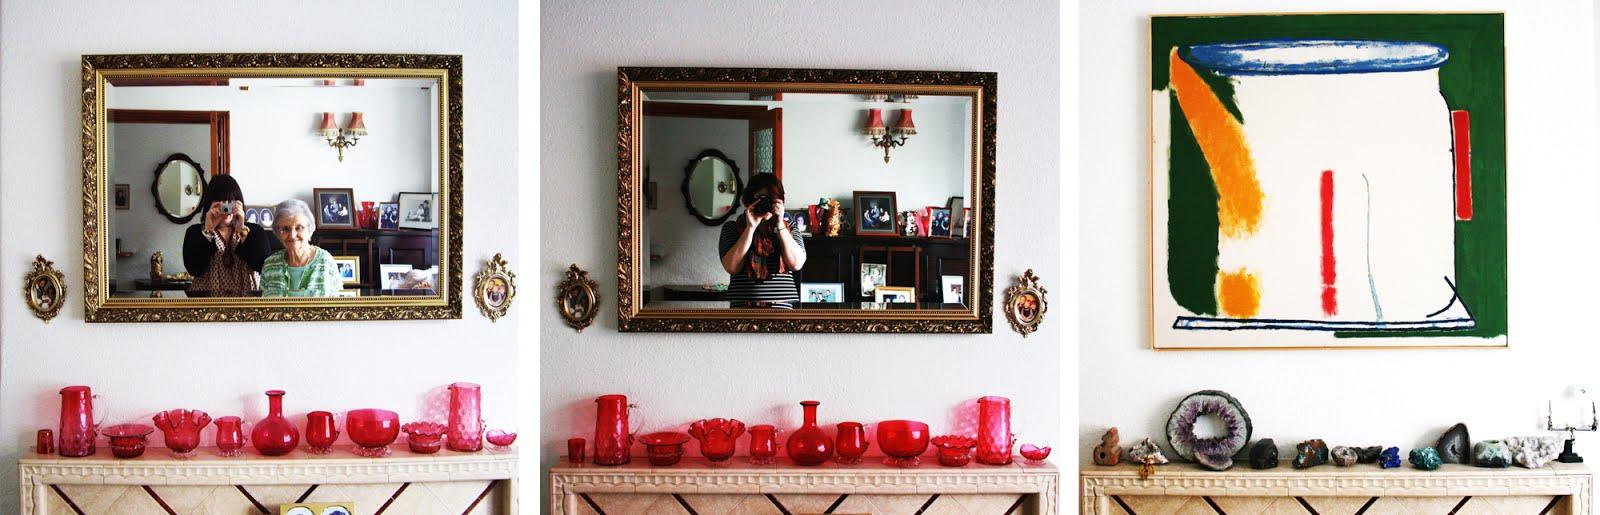 Rebecca F.Hardy - Visual Artist